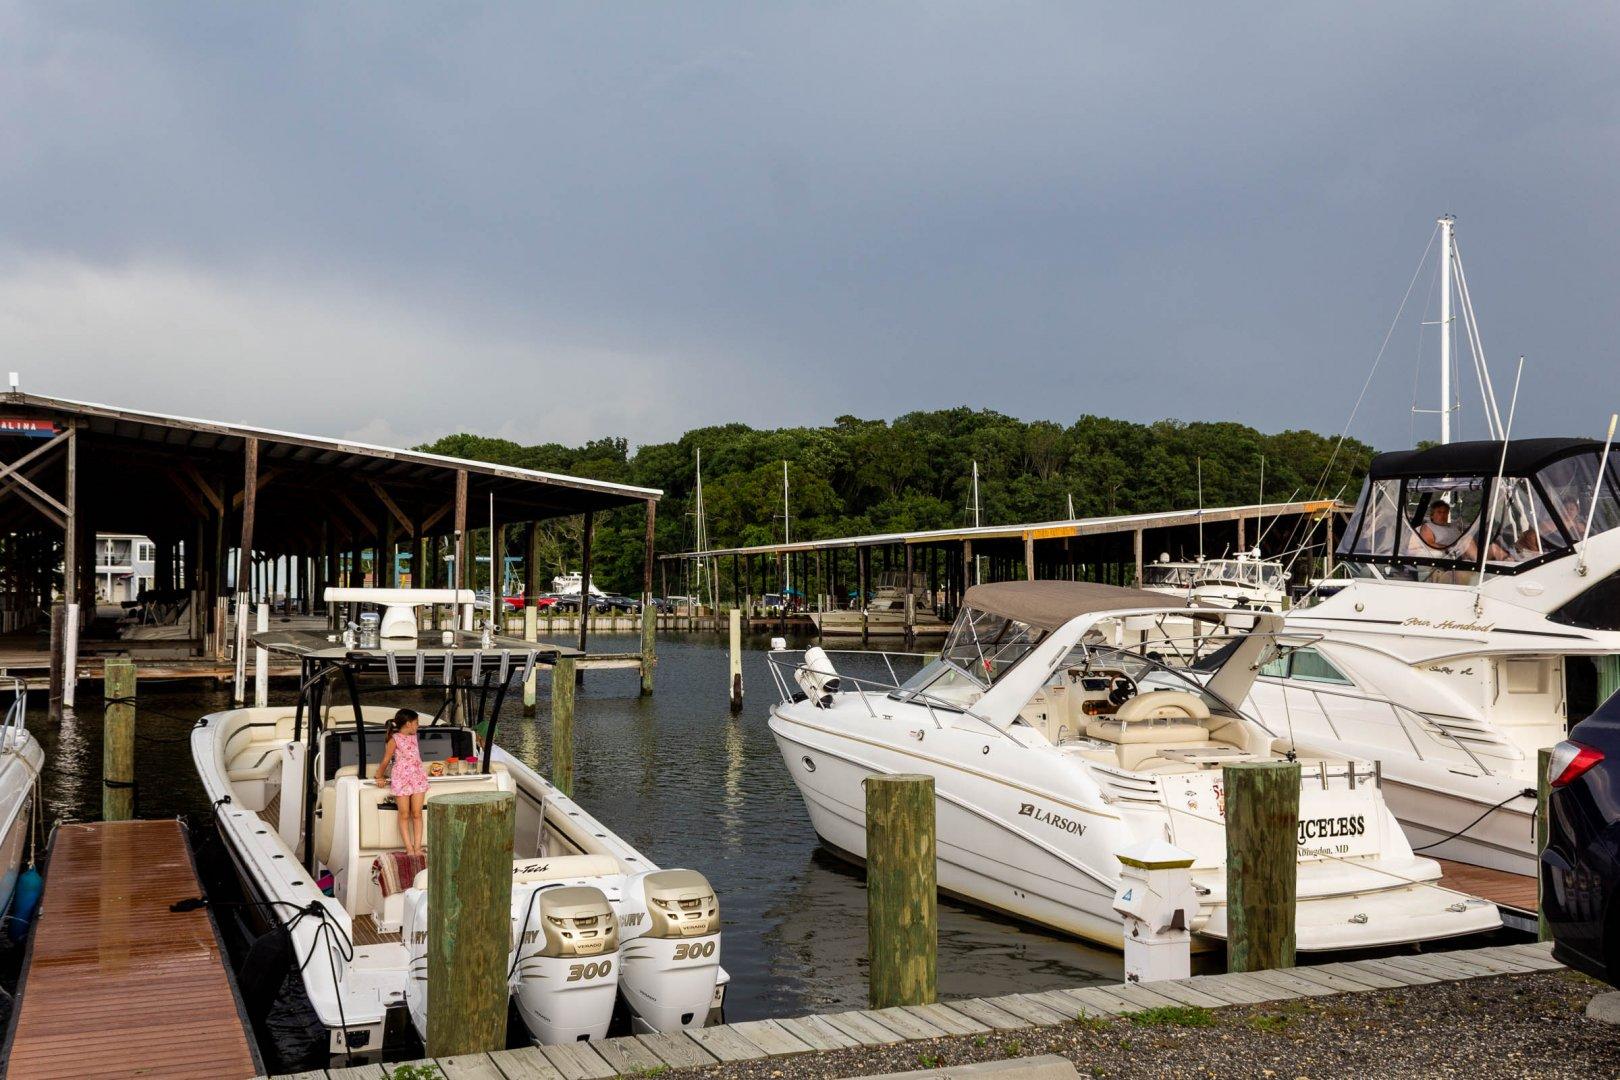 28 Shanty docks_web_size.jpg